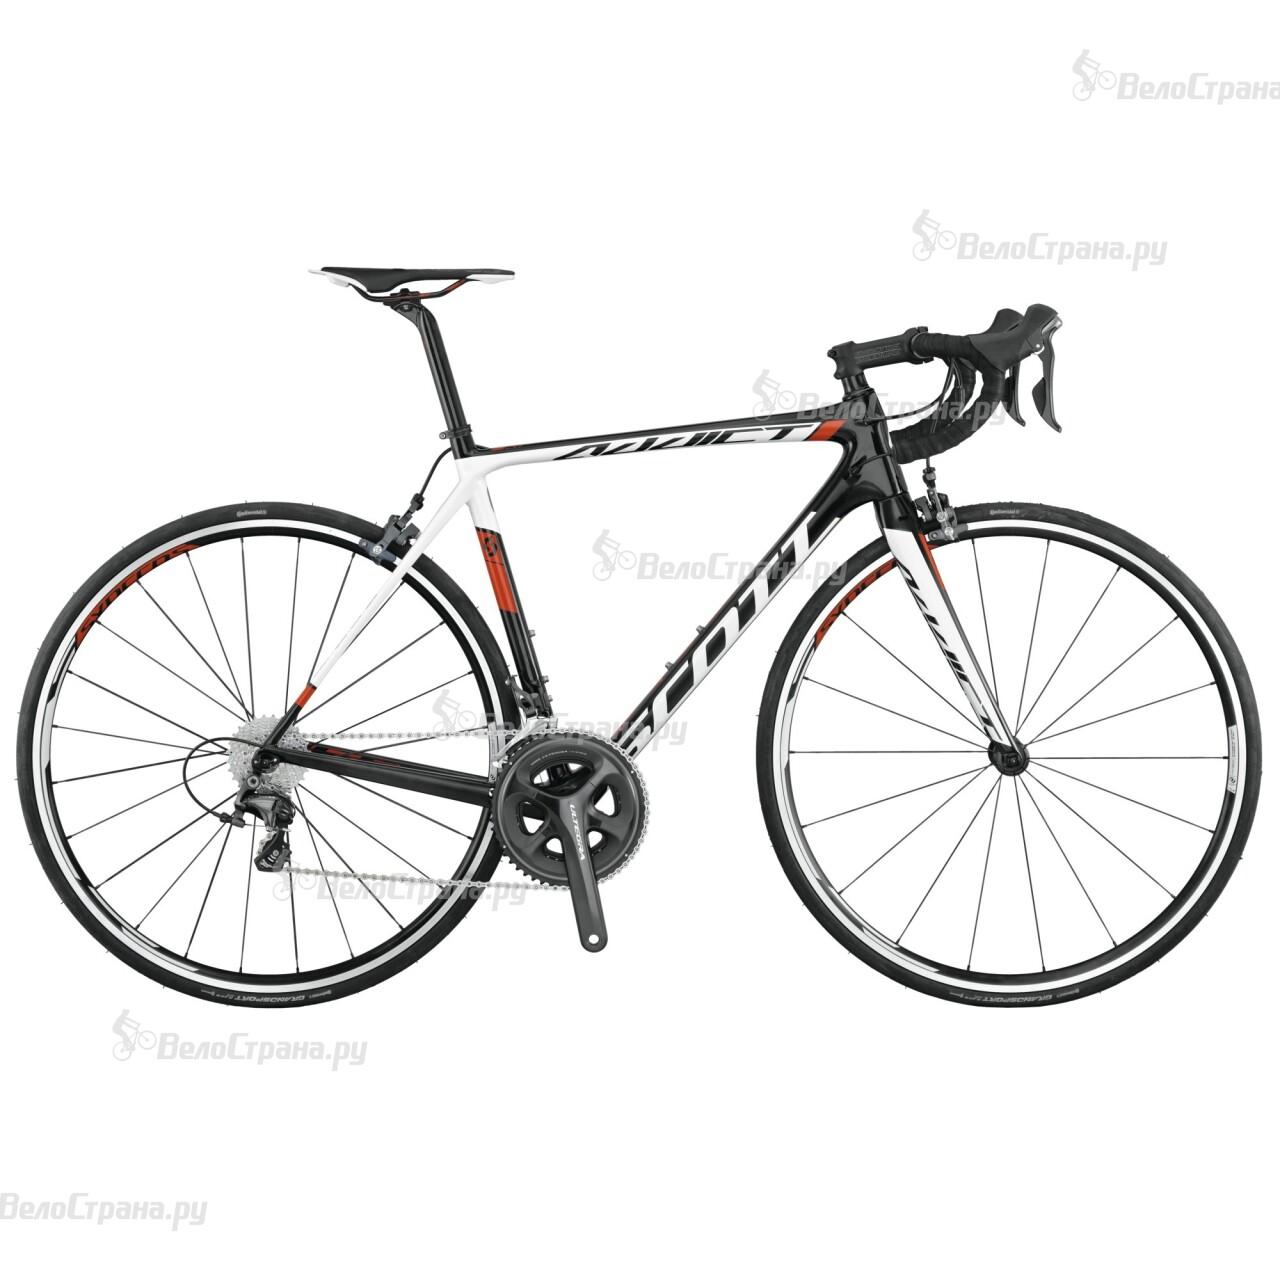 Велосипед Scott Addict 20 (2015) scott addict sl compact 2015